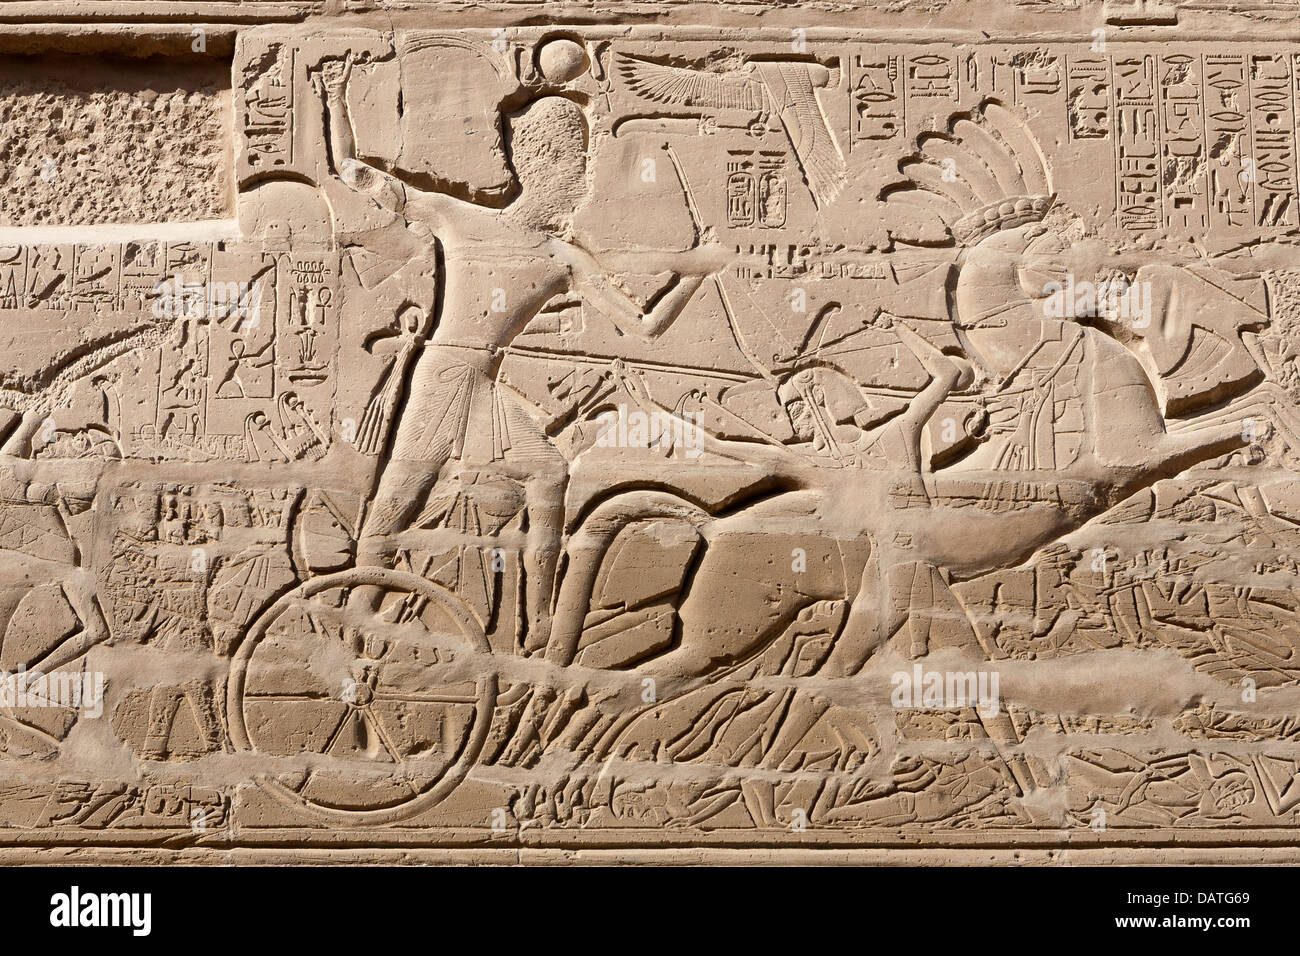 Pharaoh driving chariot scene at The Temple of Amun at Karnak, Luxor Egypt - Stock Image